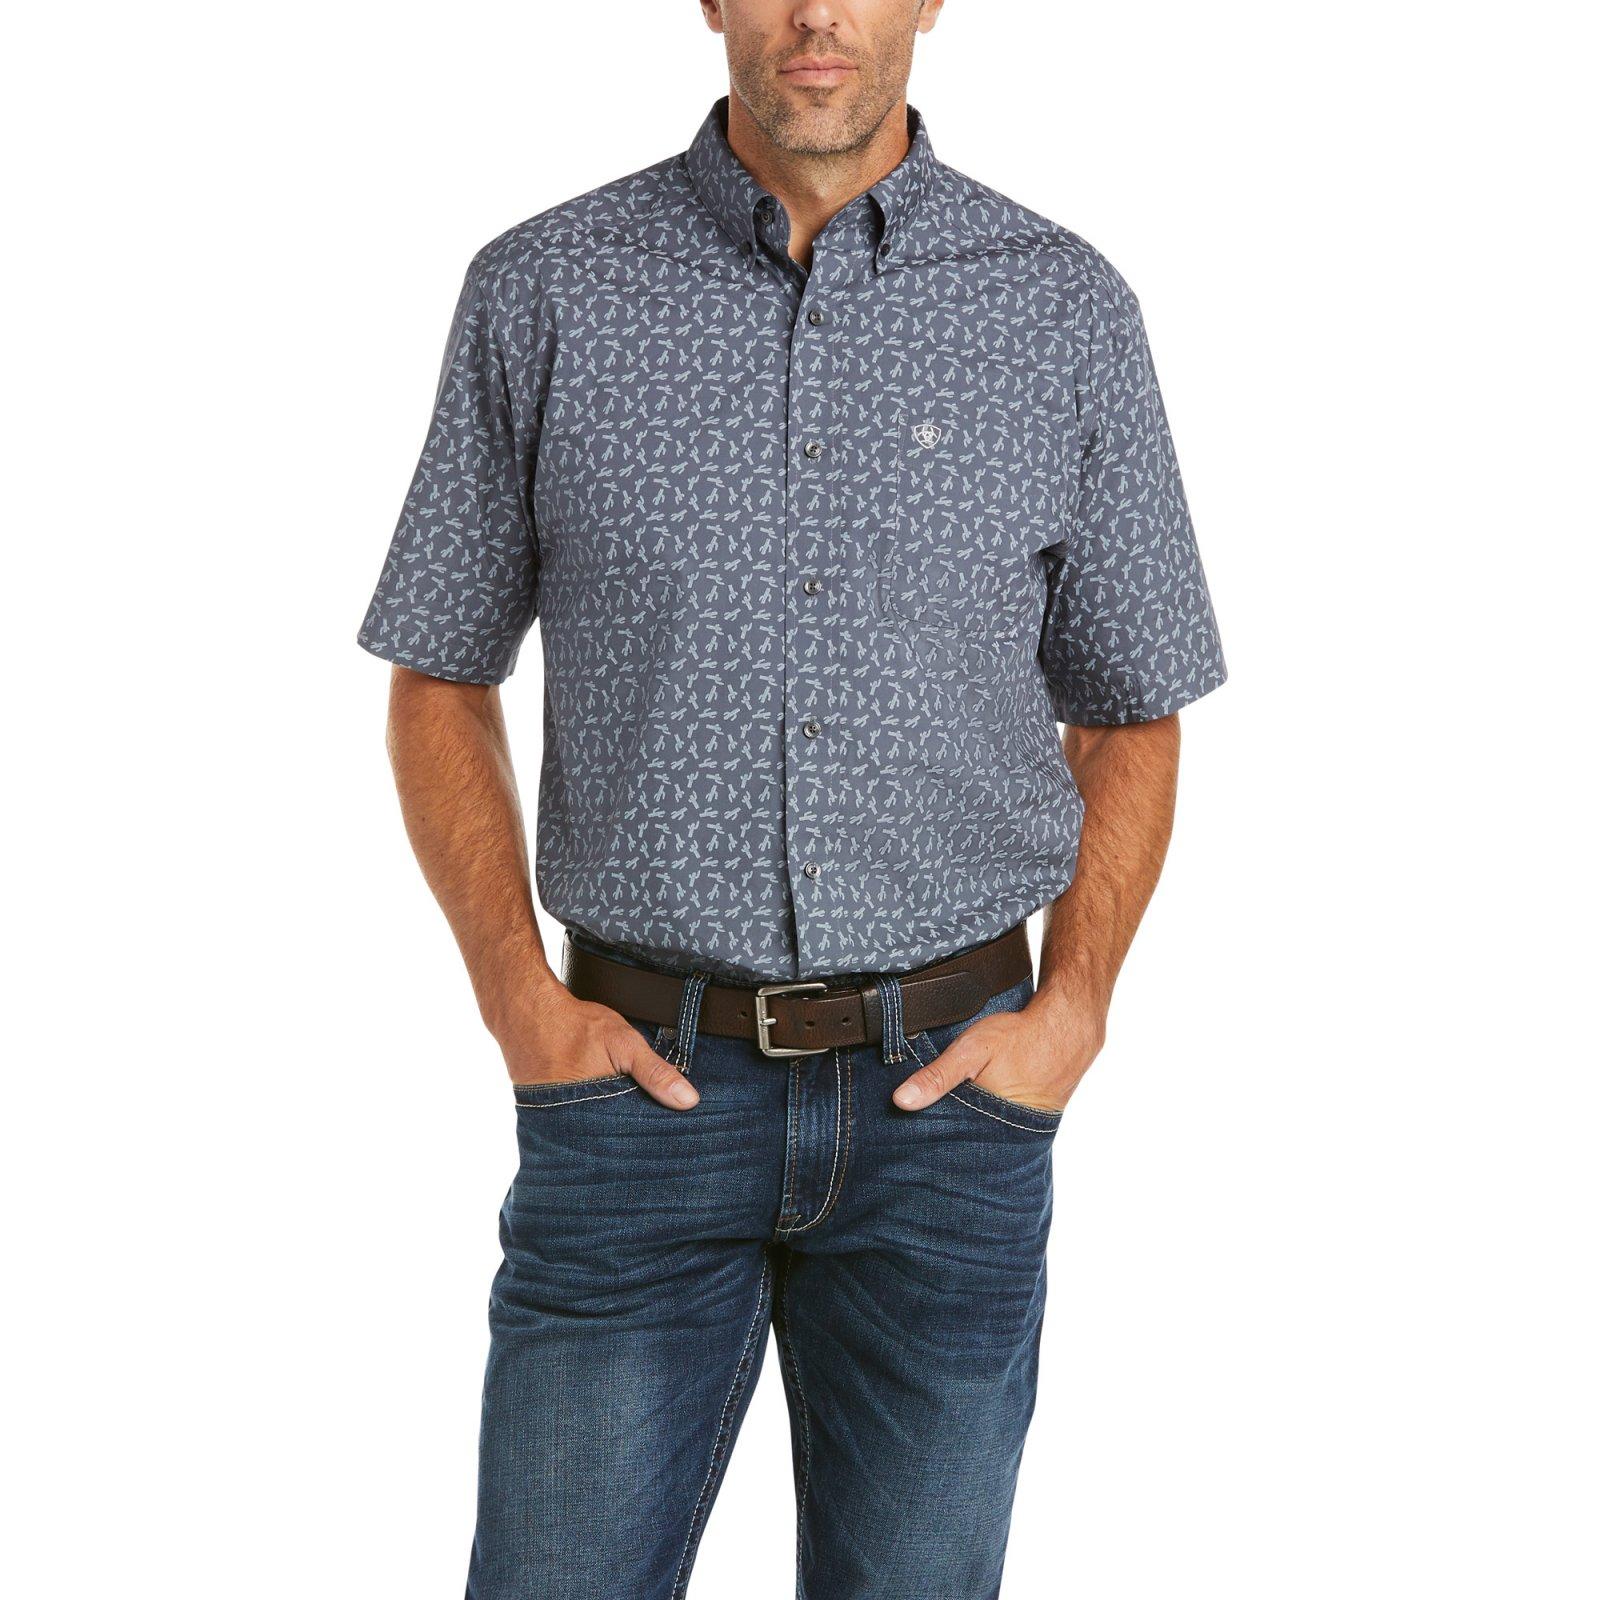 Tarez Classic Fit Short Sleeve Shirt from Ariat